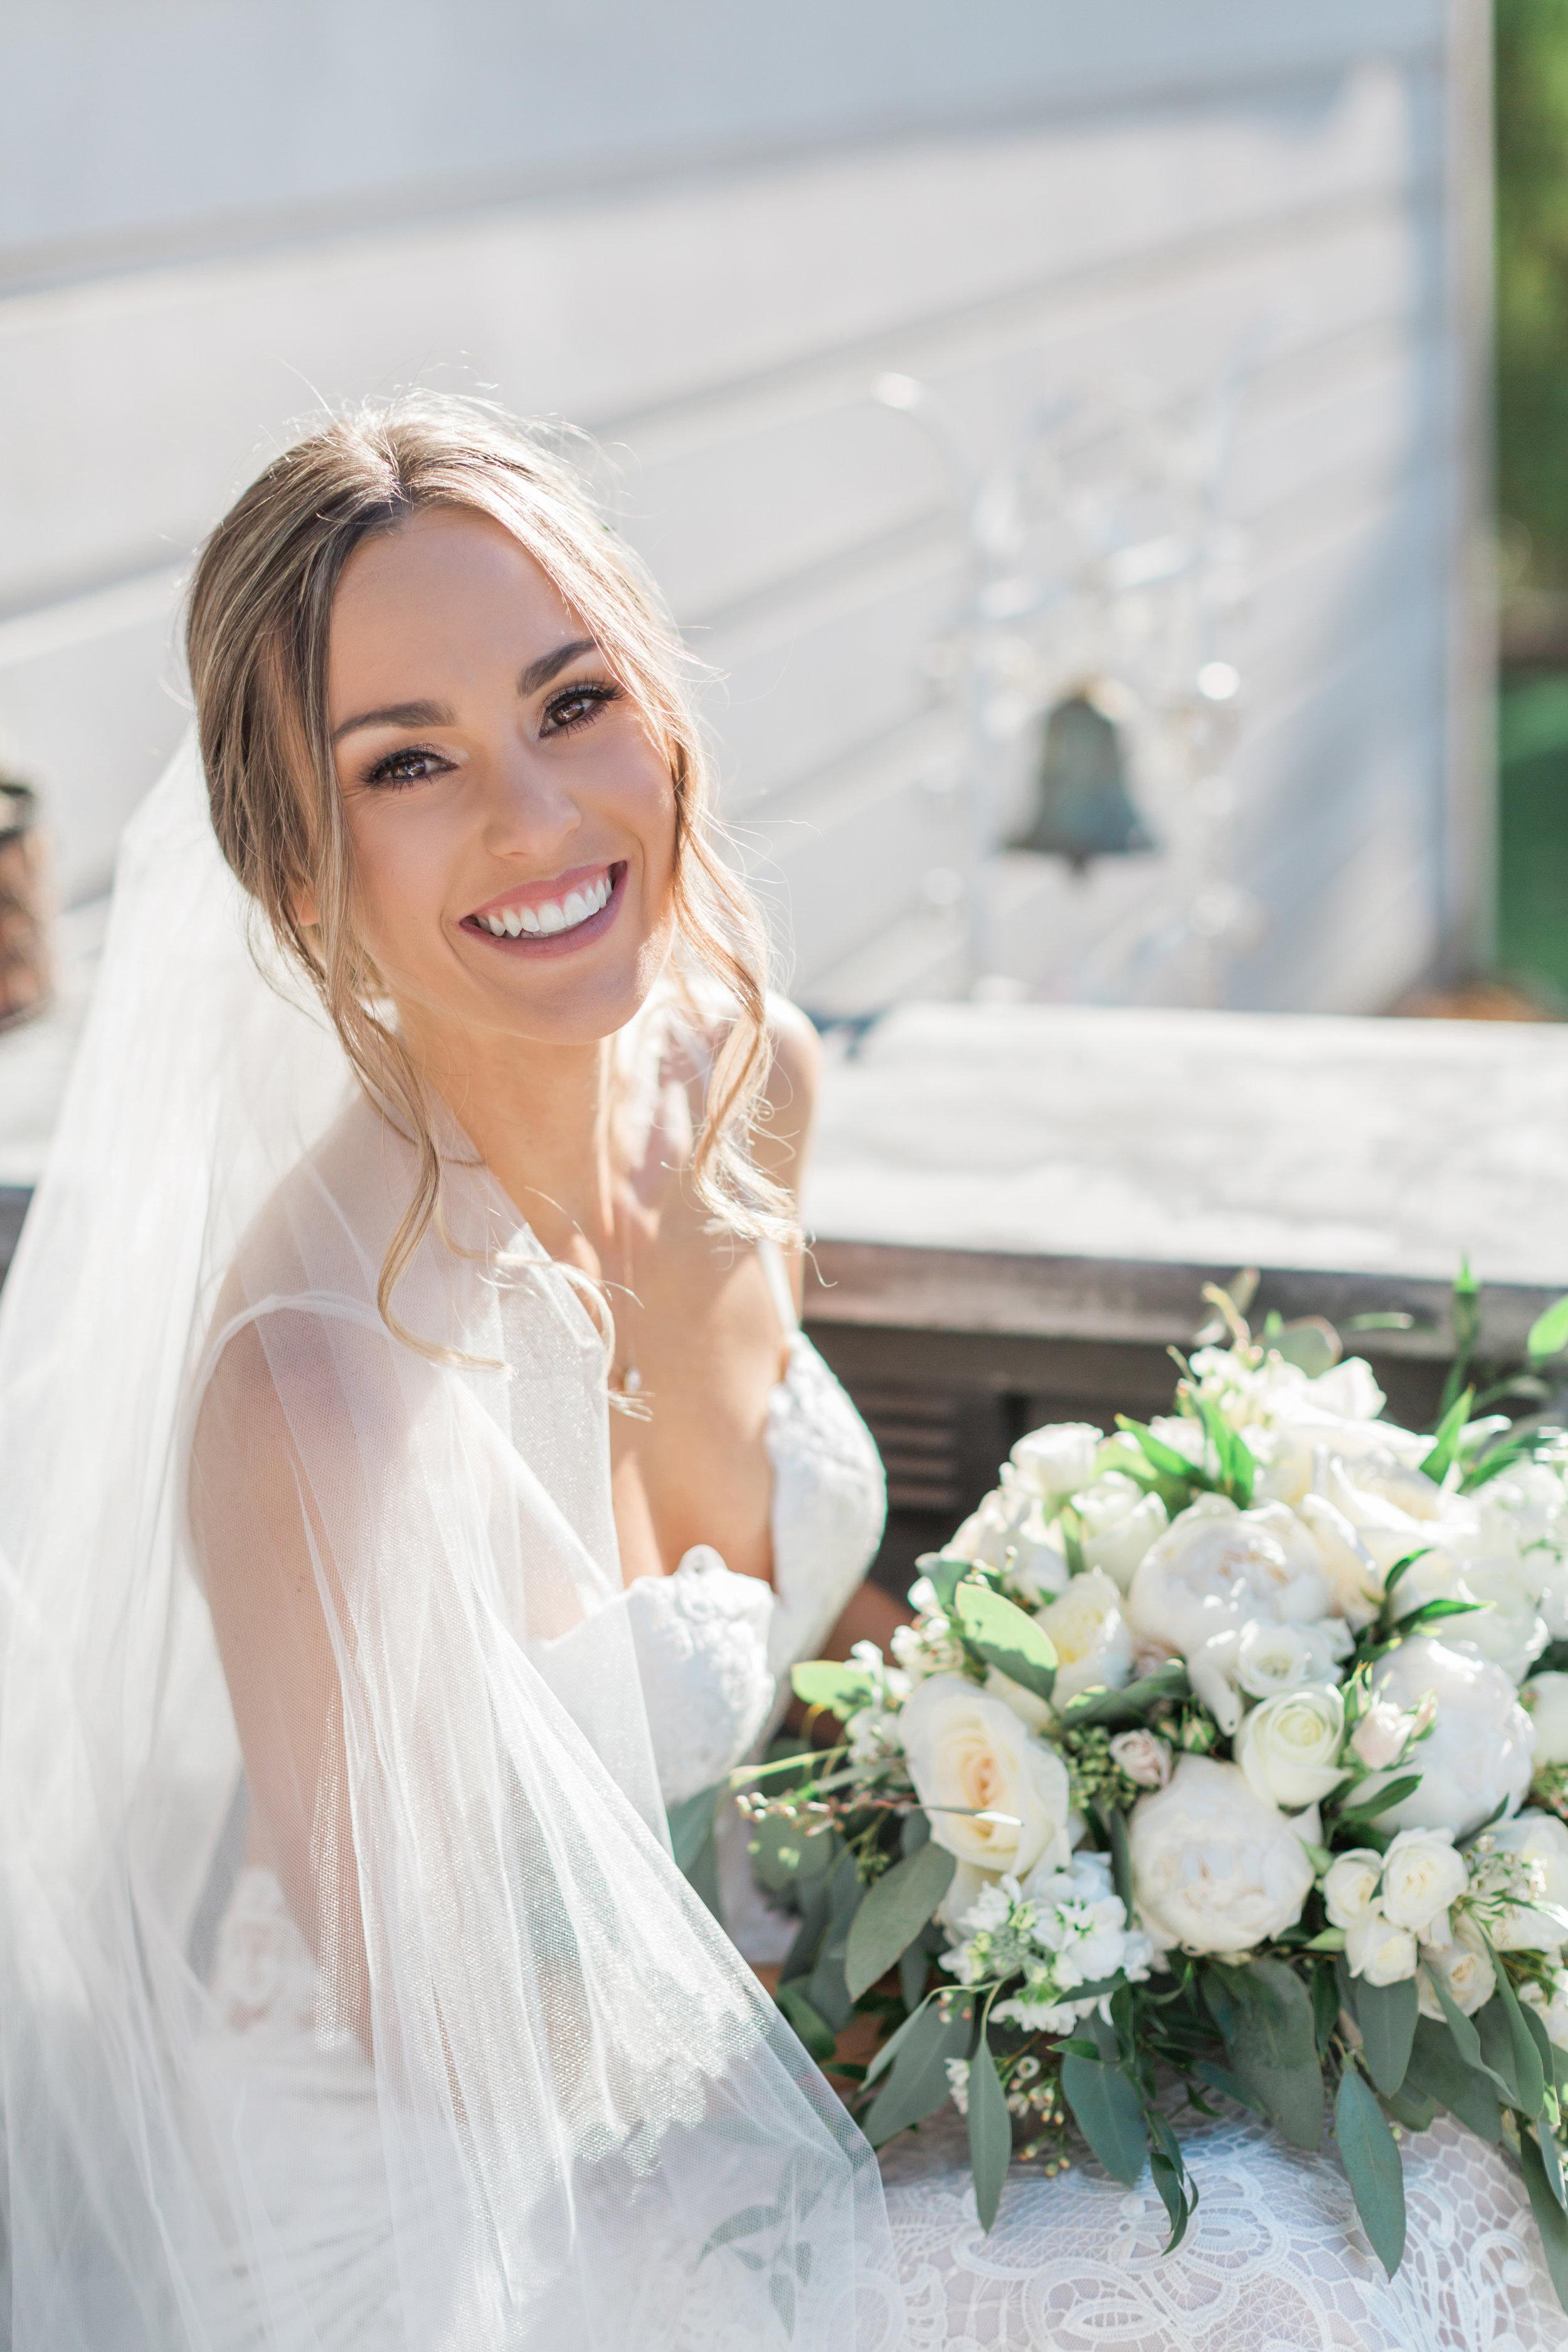 bride-portrait-rustic-wedding-2.jpg